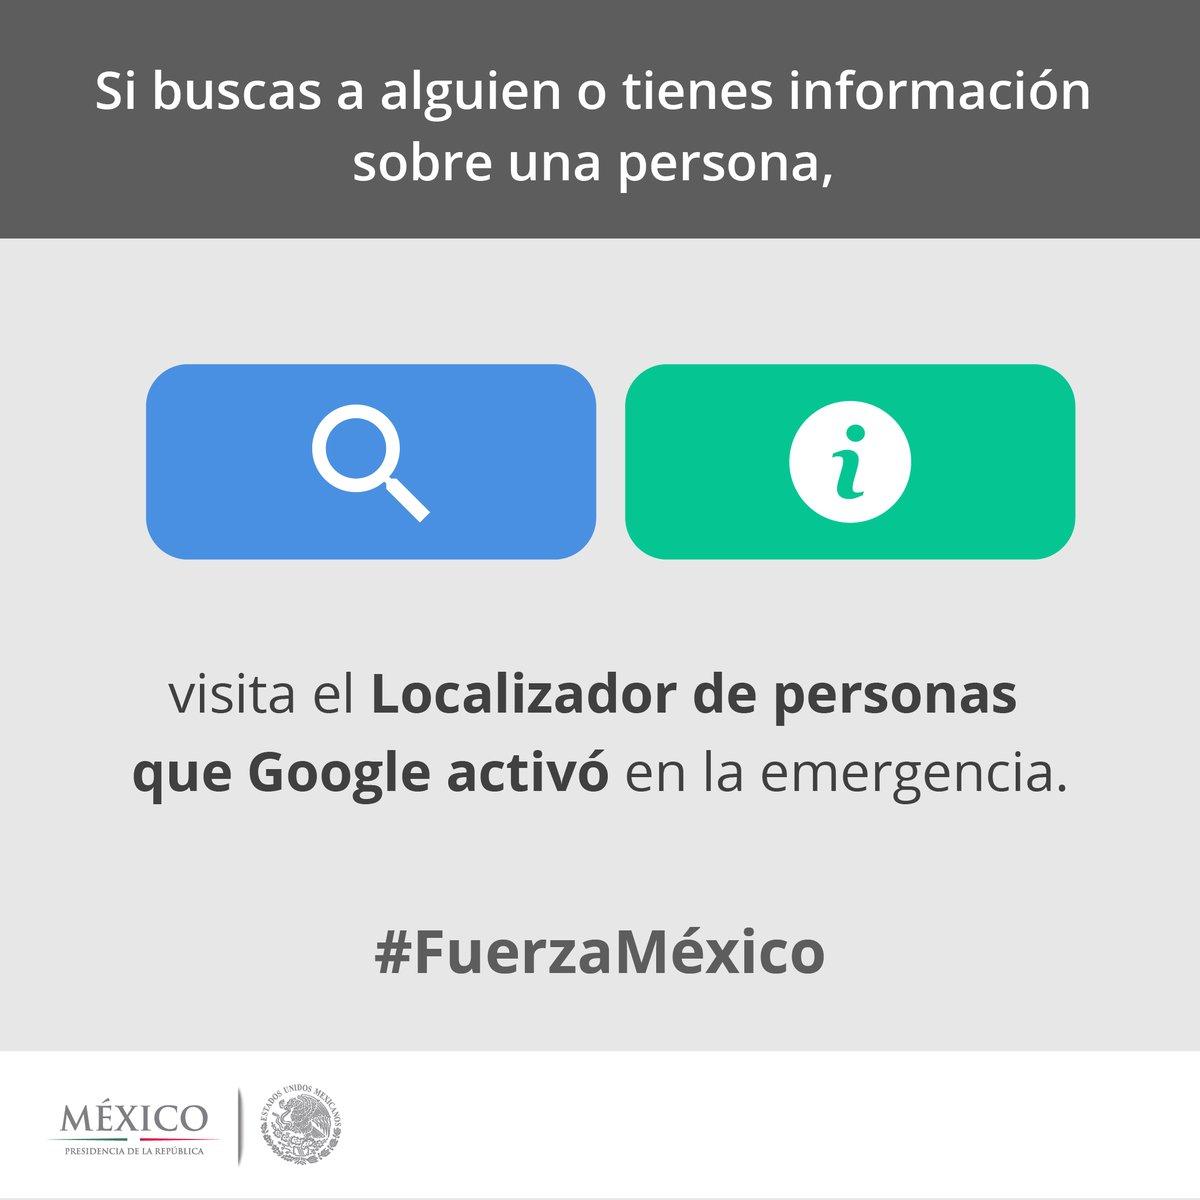 Recuerden utilizar el localizador de personas de Google: https://t.co/0OYe9NWxy0  #SismoMX https://t.co/I7Tii2lkHW